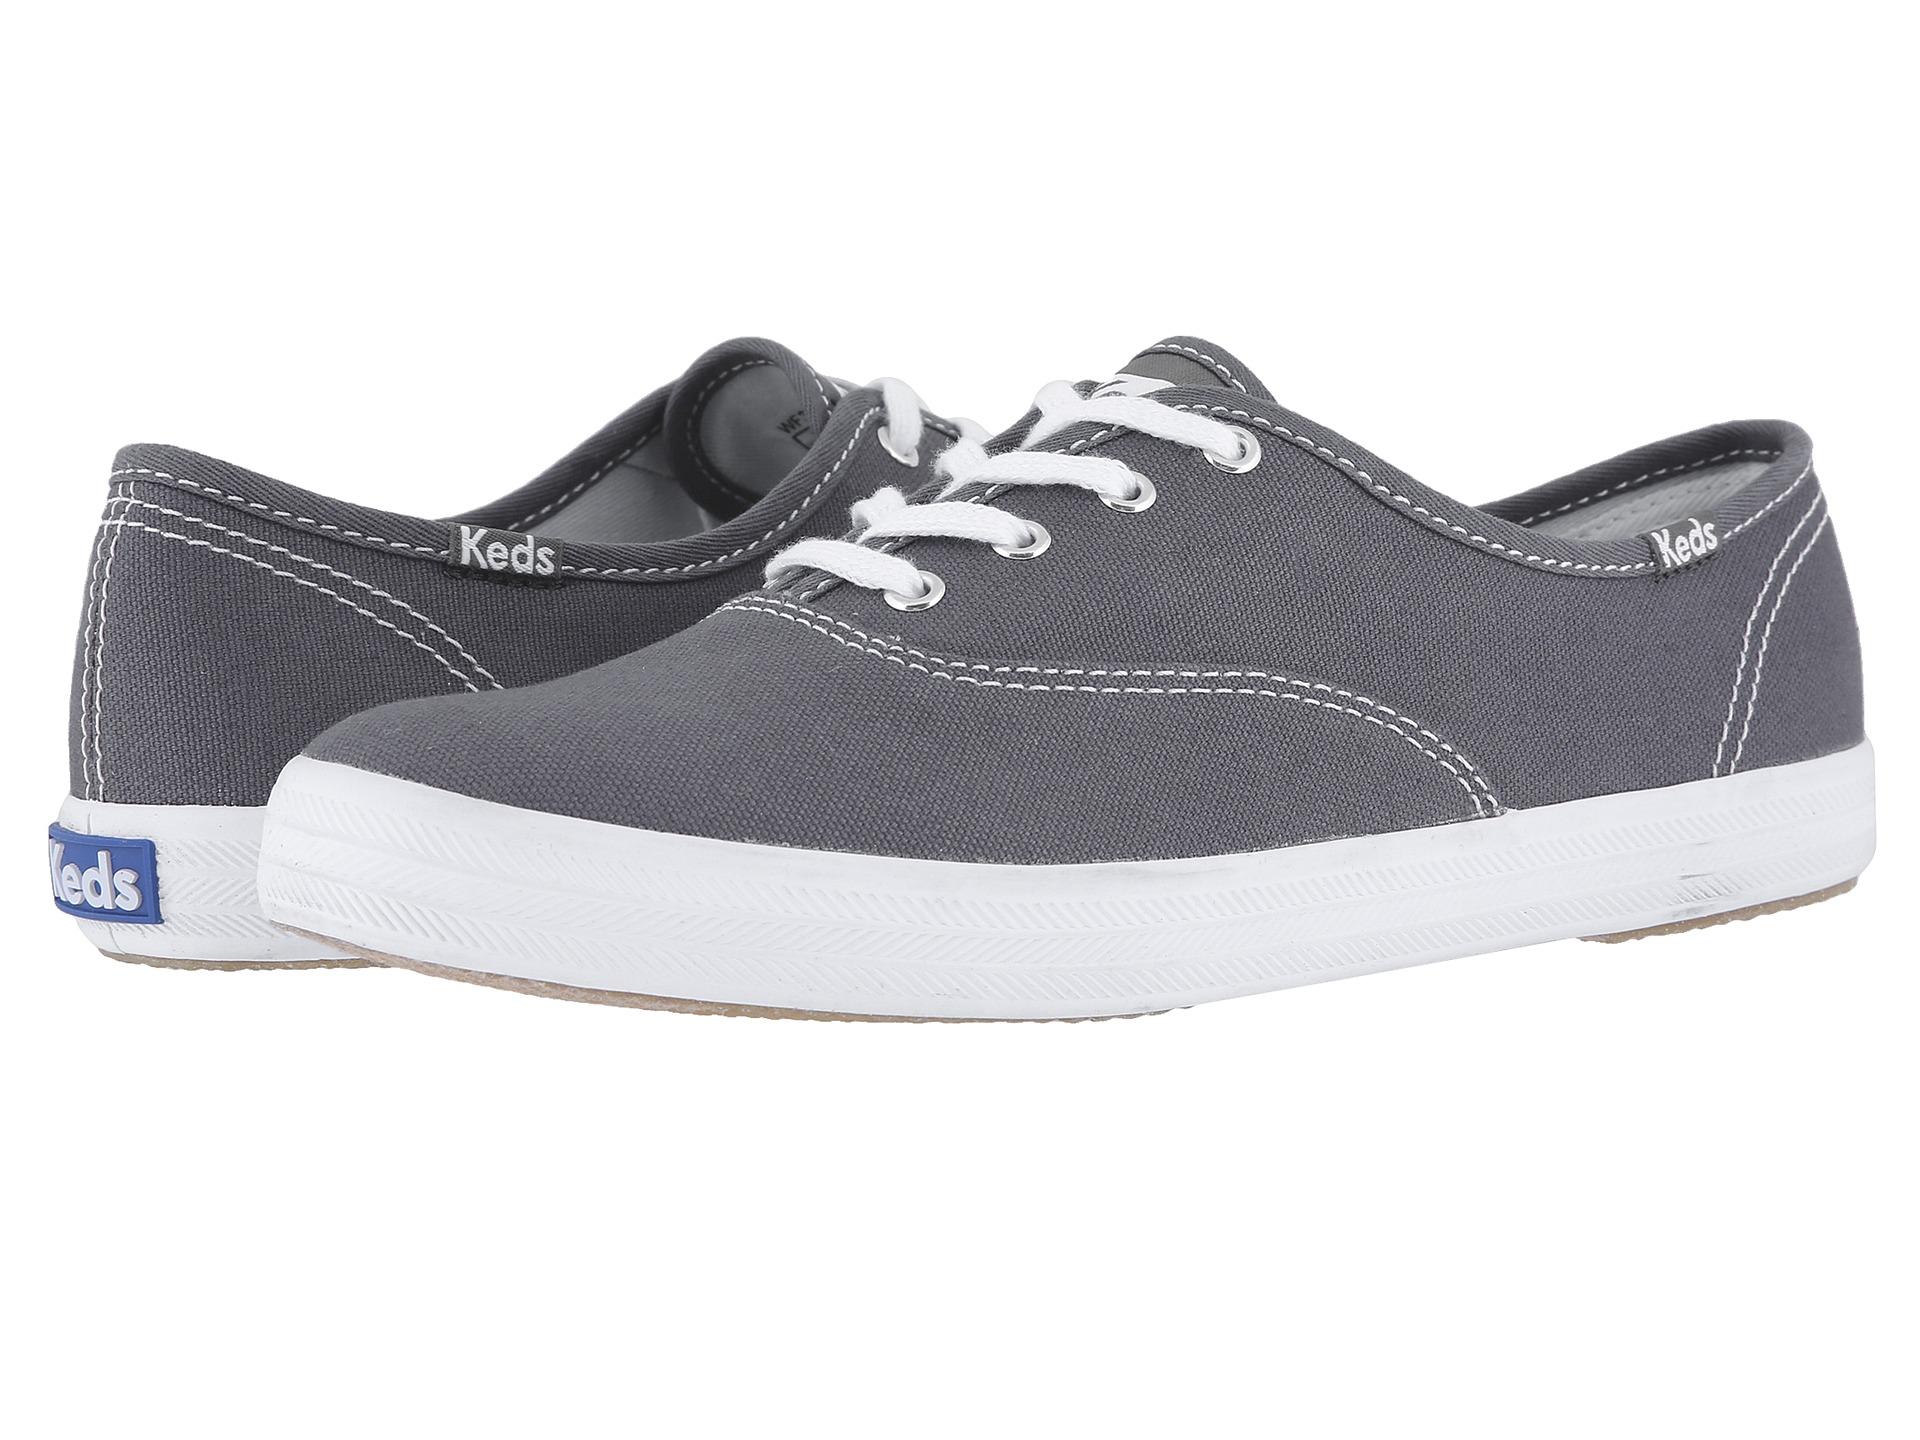 S Keds Shoes